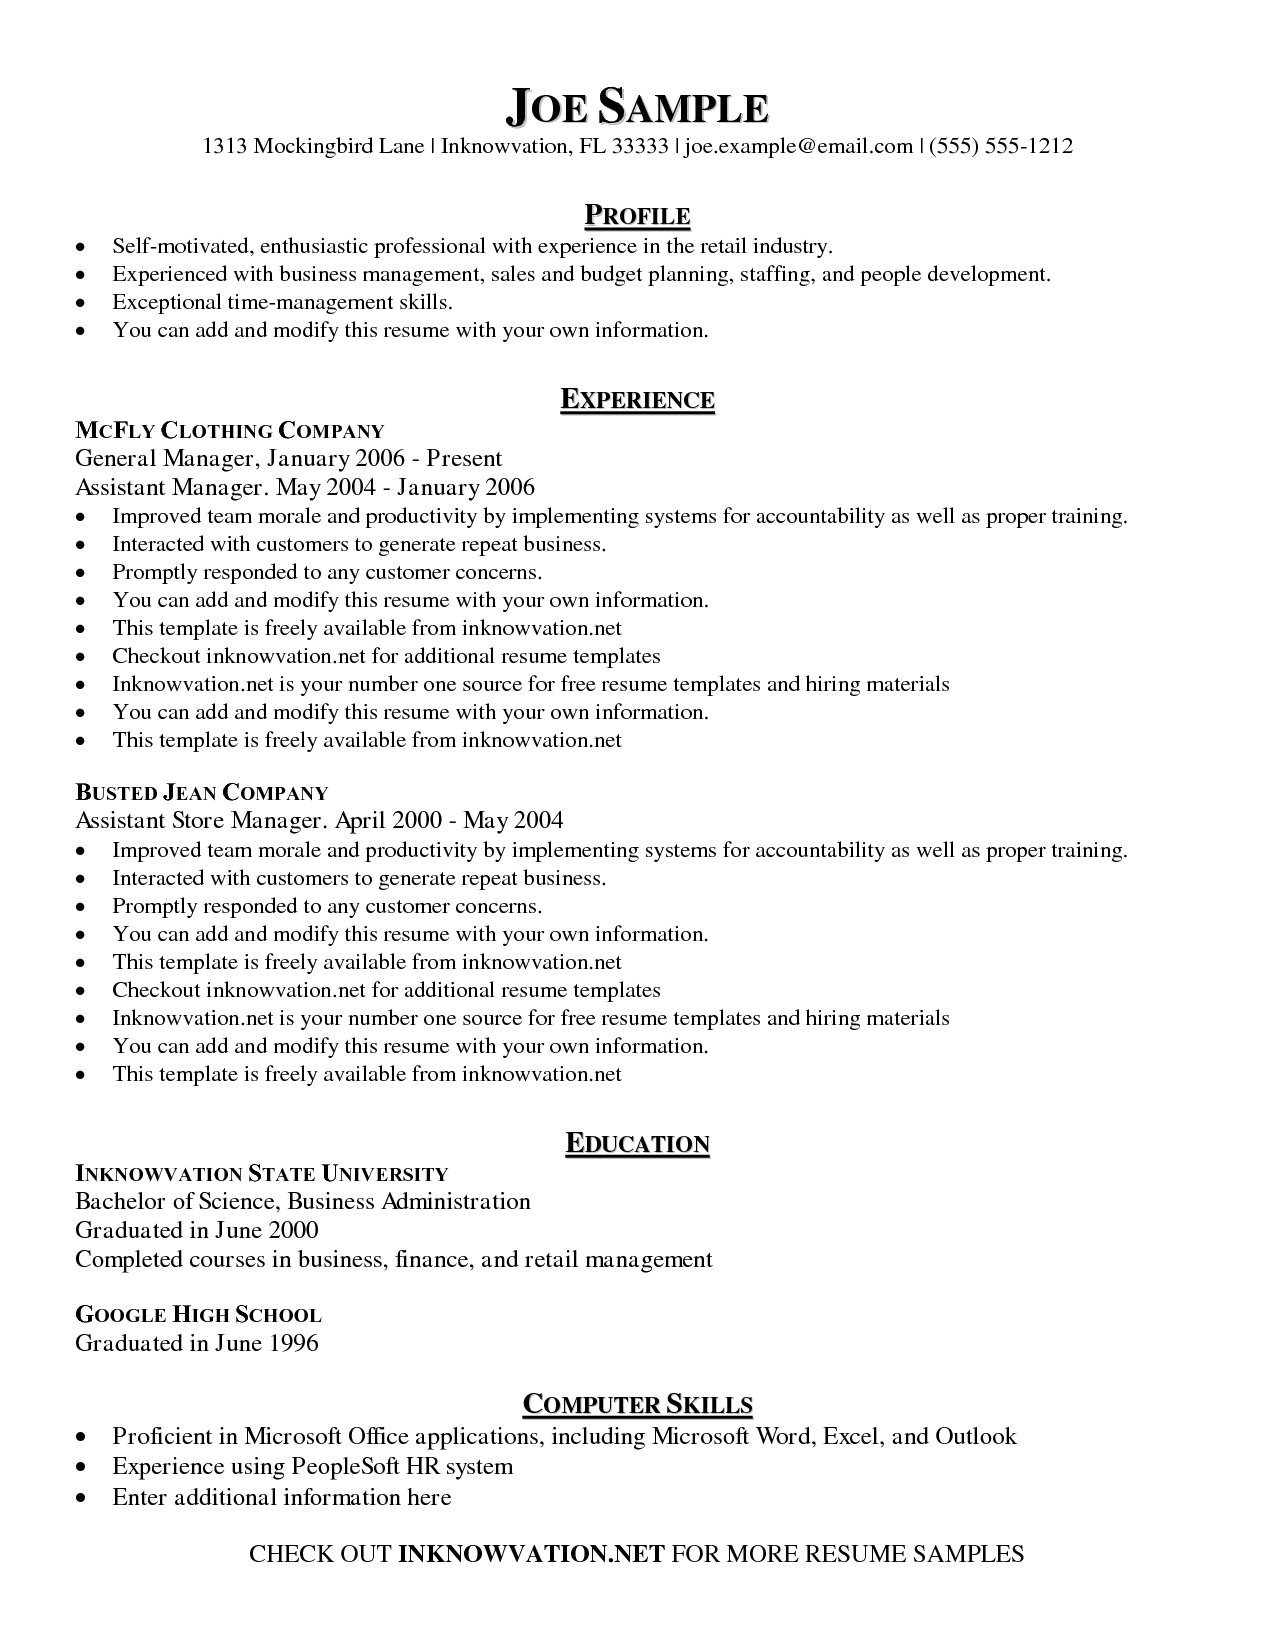 Free Sample Resume Formats Fancy Templates 5   tjfs journal.org